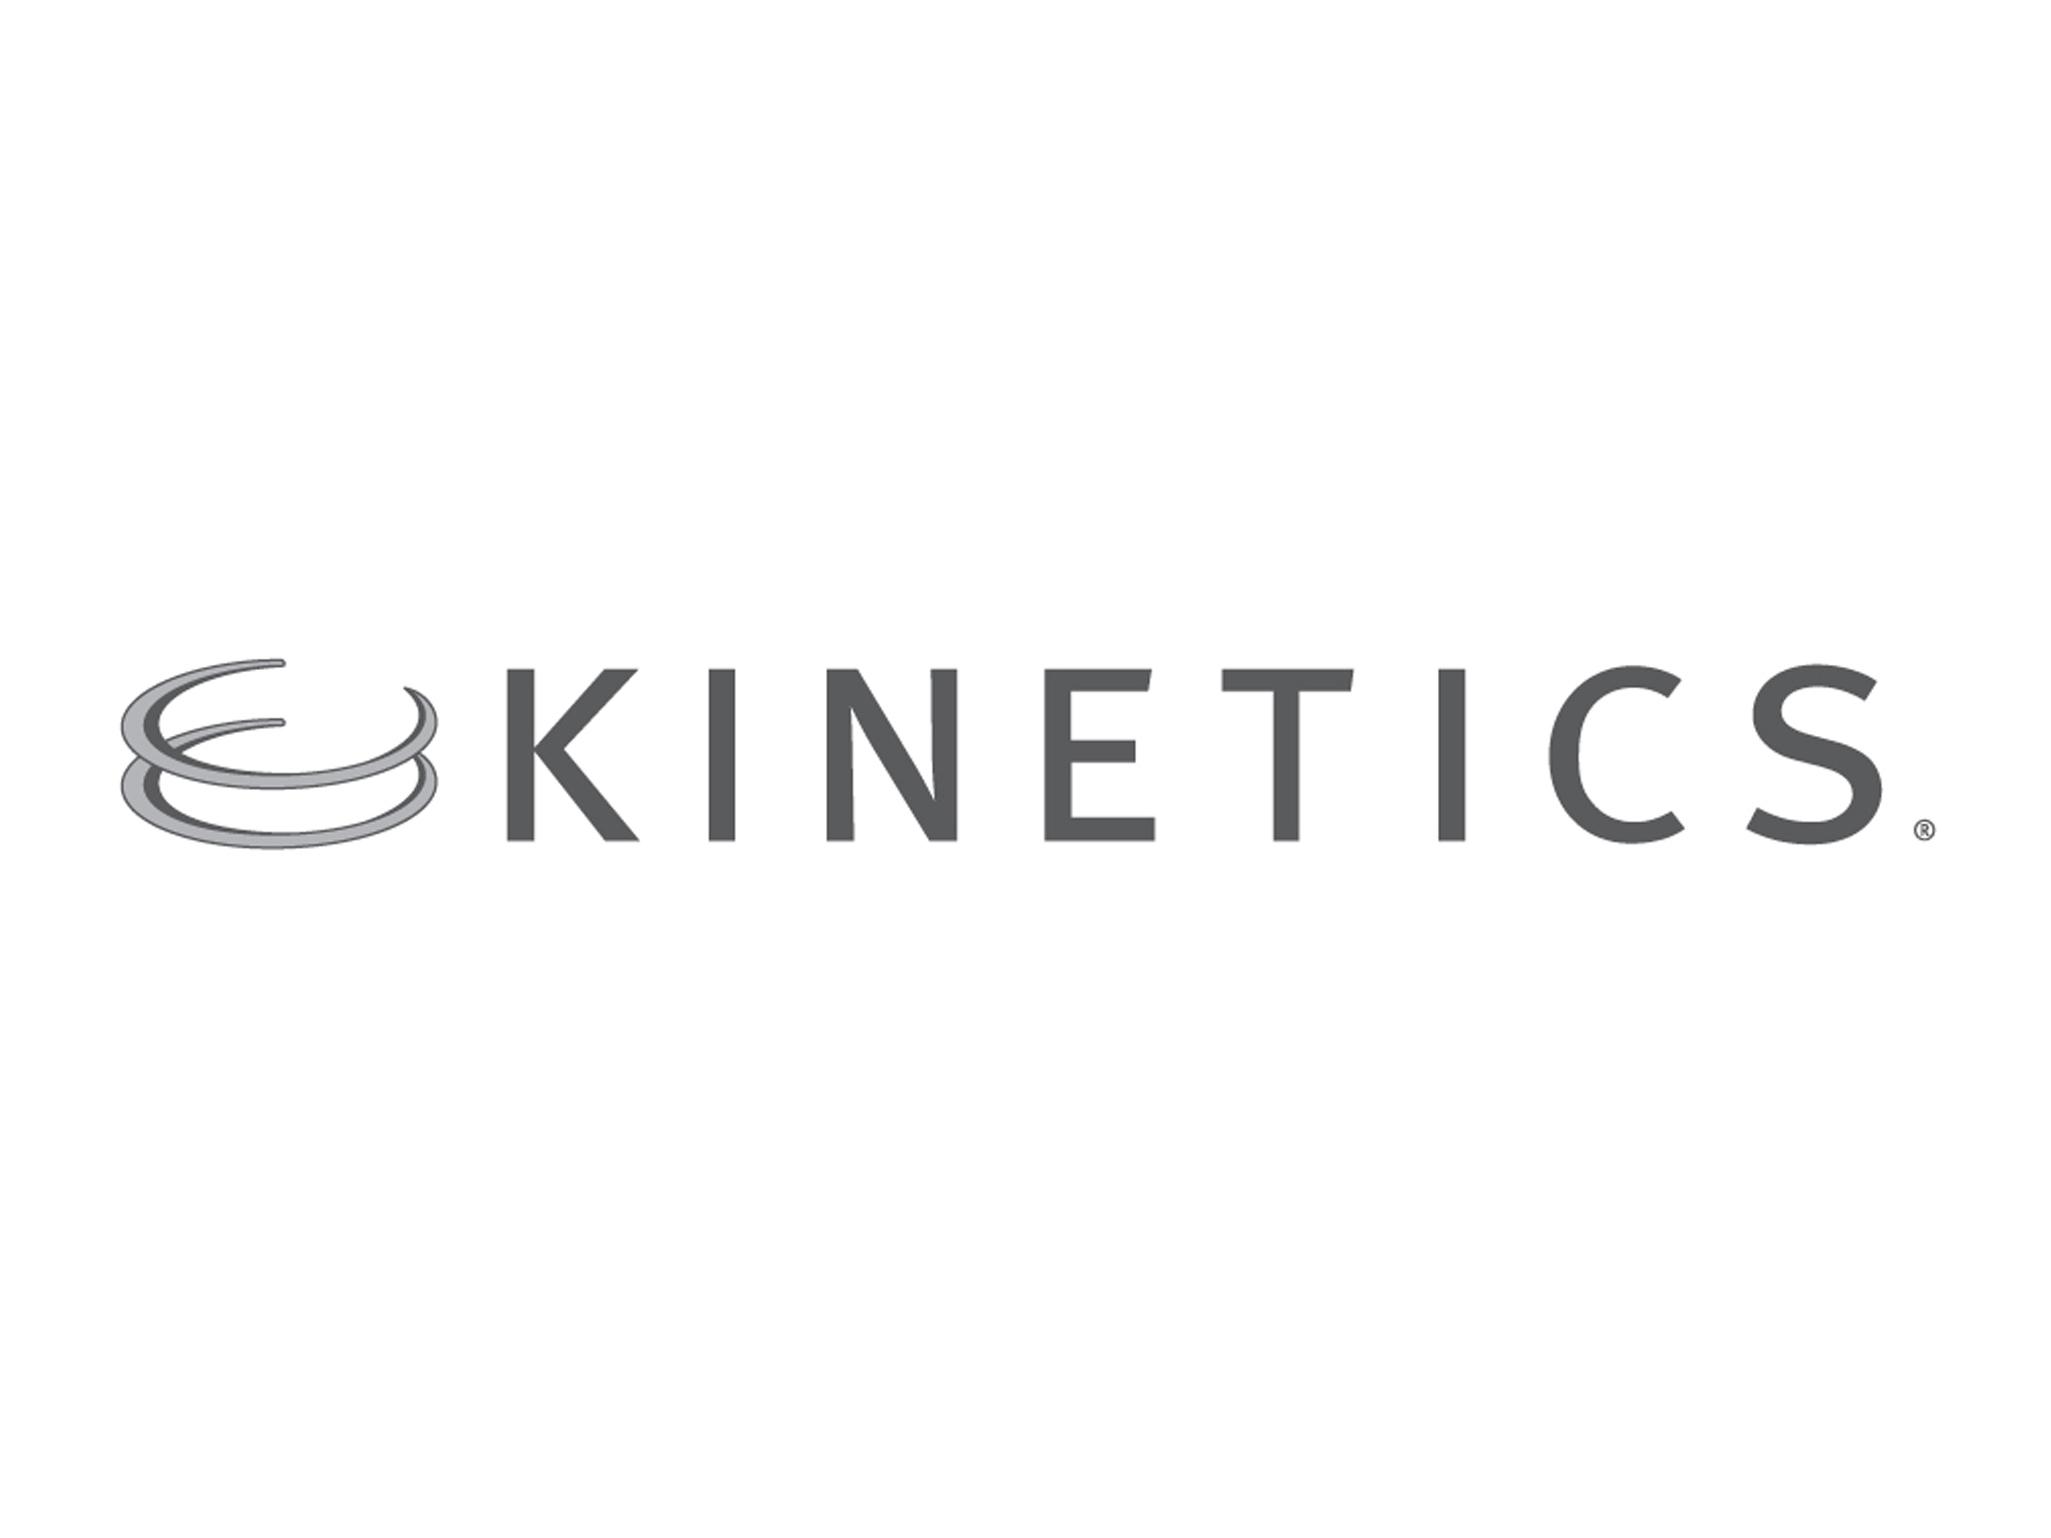 KINETICS LOGO 2015.jpg